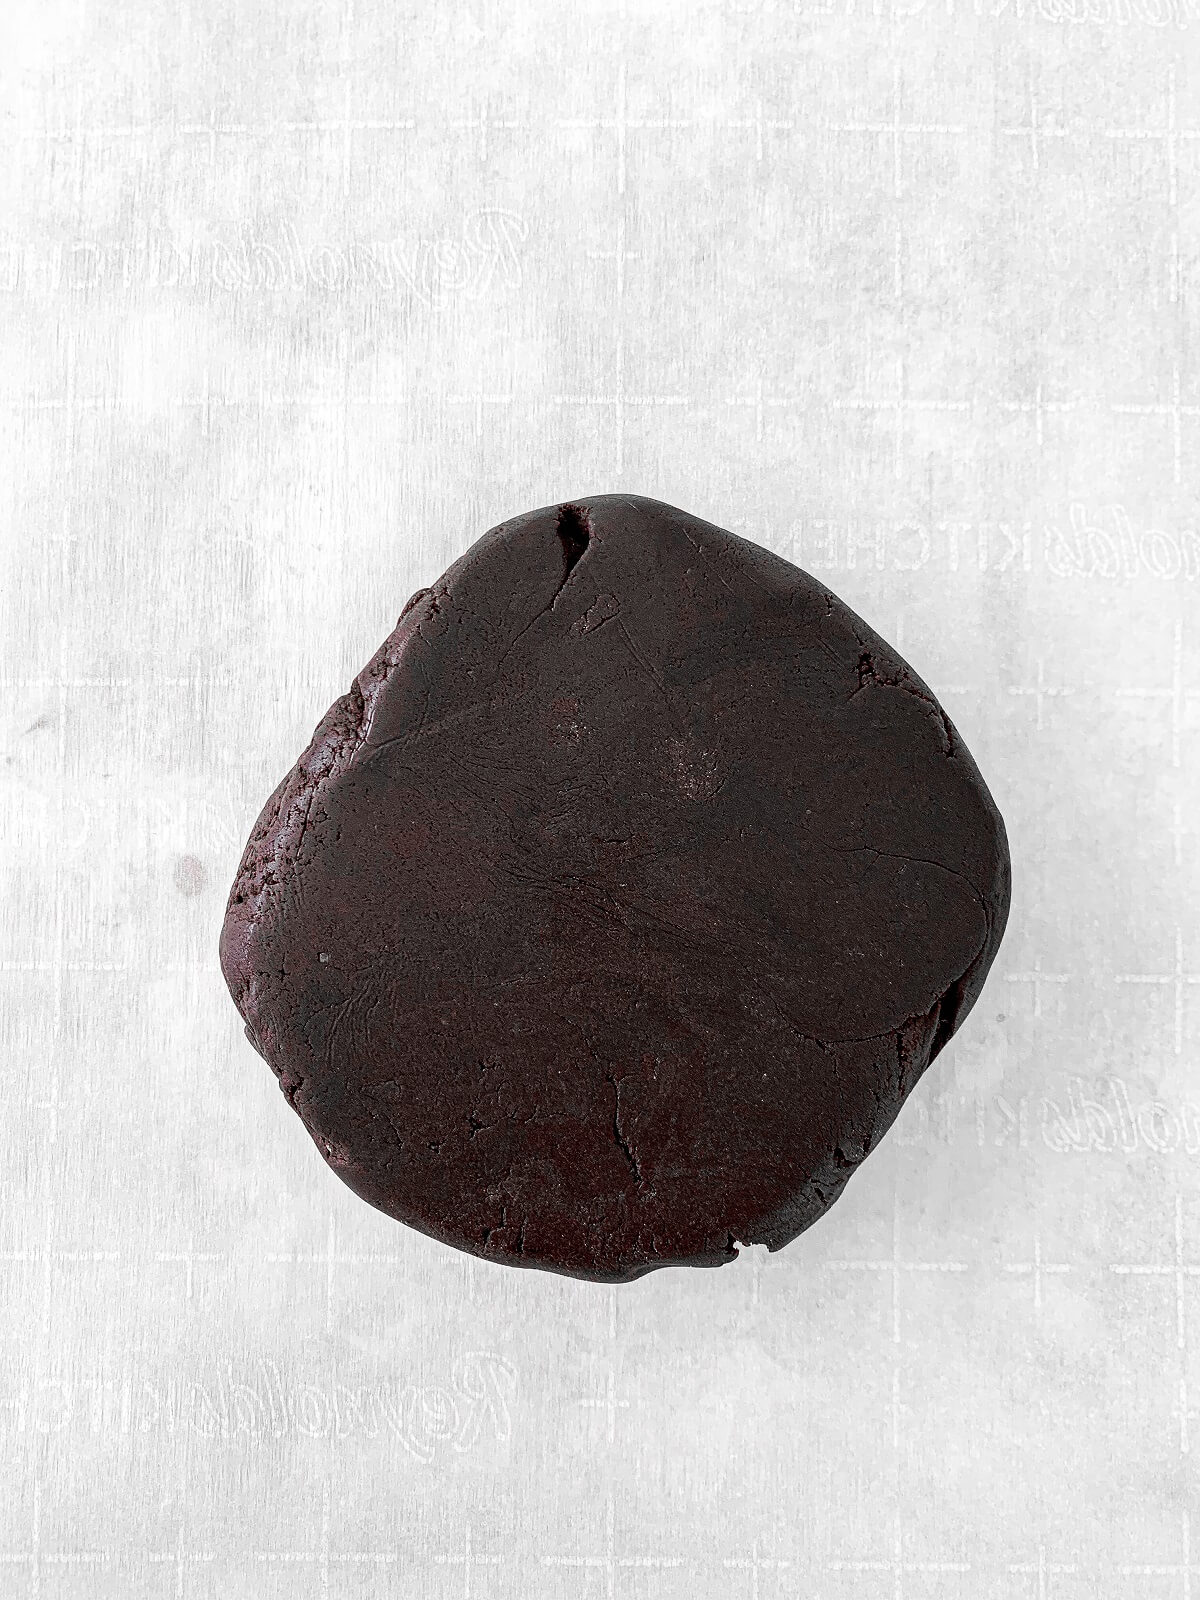 Chocolate shortbread cookie dough.